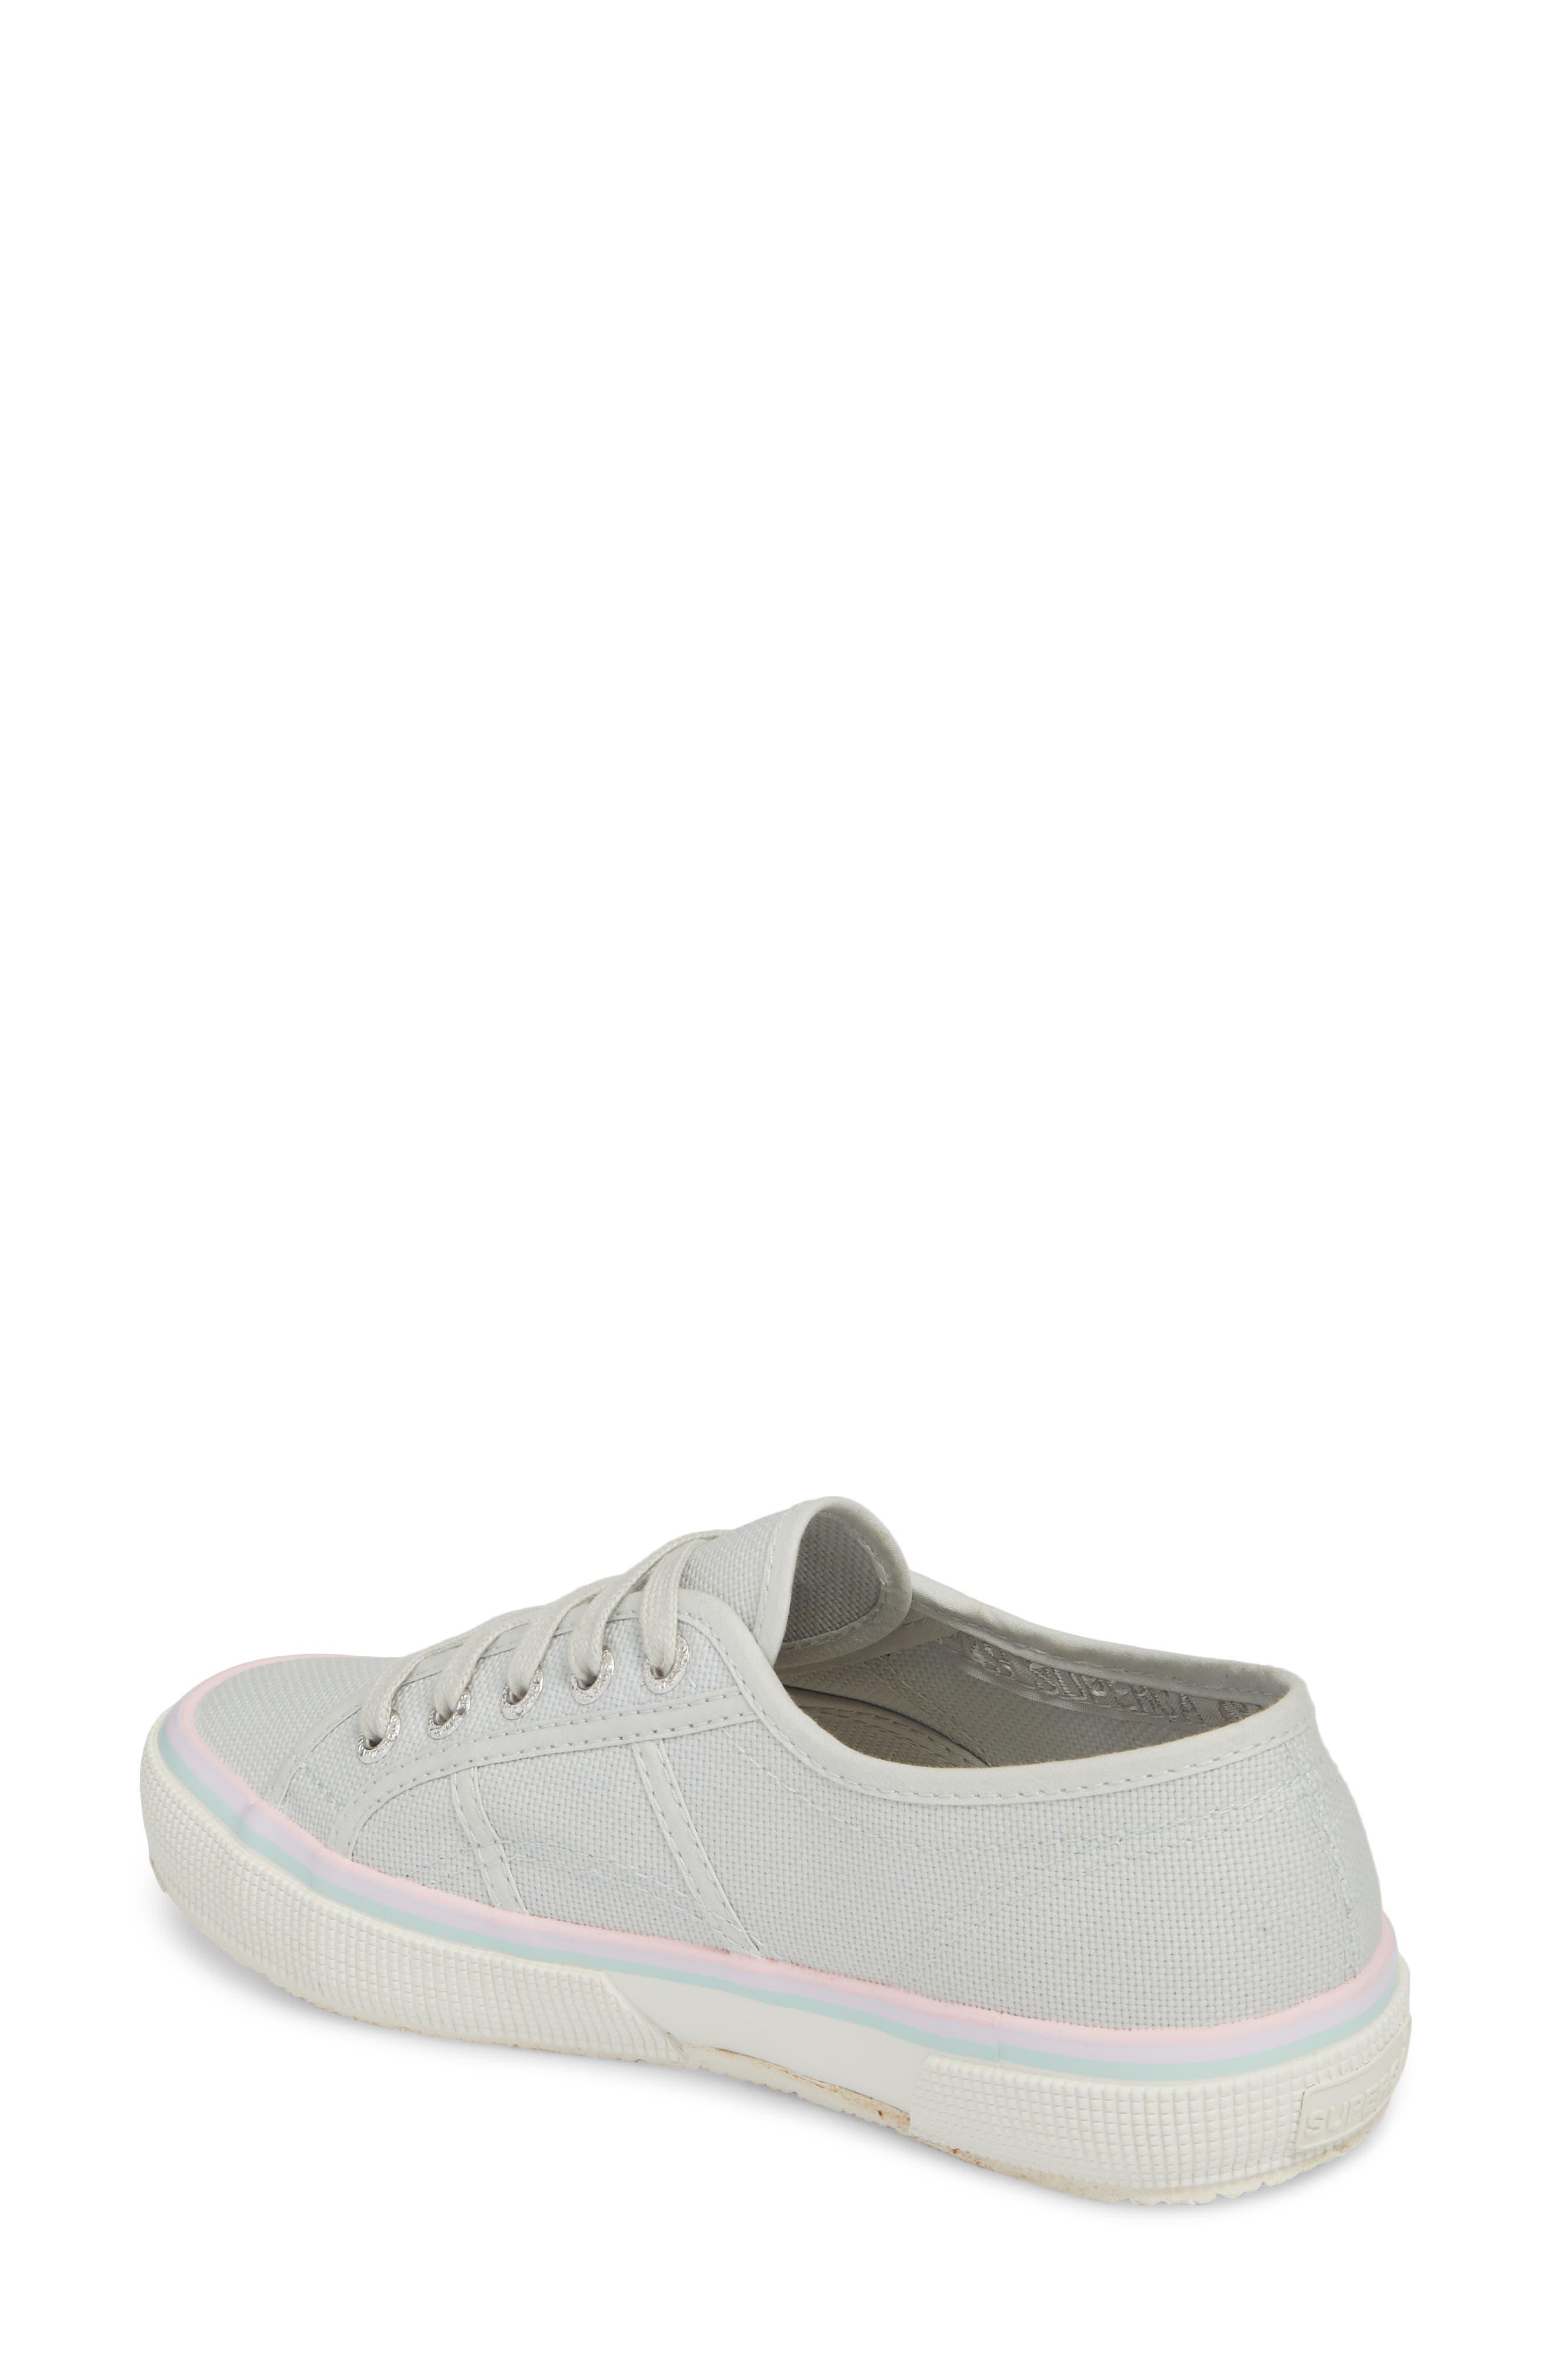 2750 Three-Stripe Sneaker,                             Alternate thumbnail 2, color,                             Aluminum